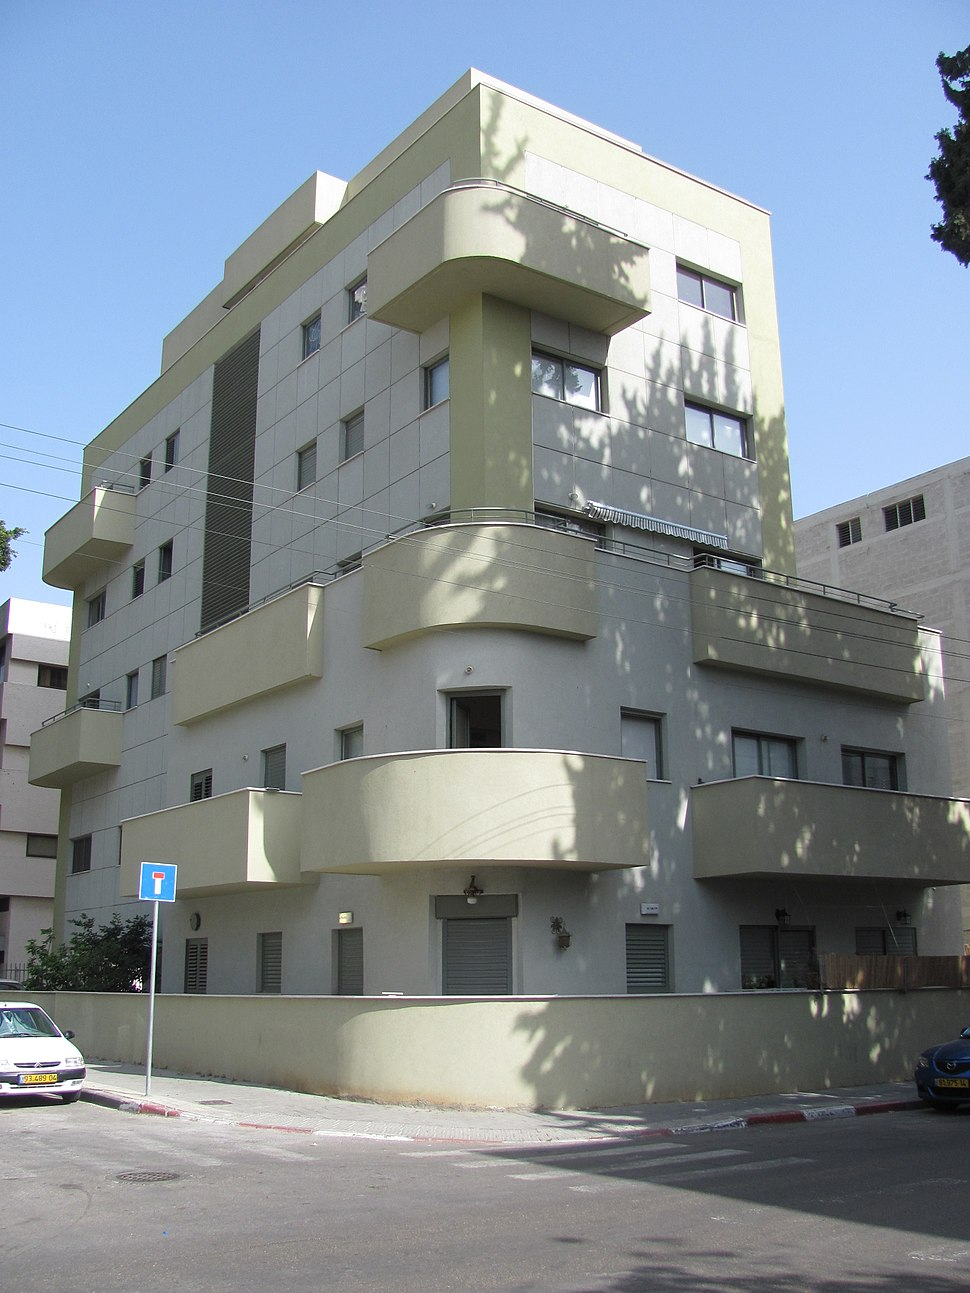 Tel Aviv Montefiore Renovation